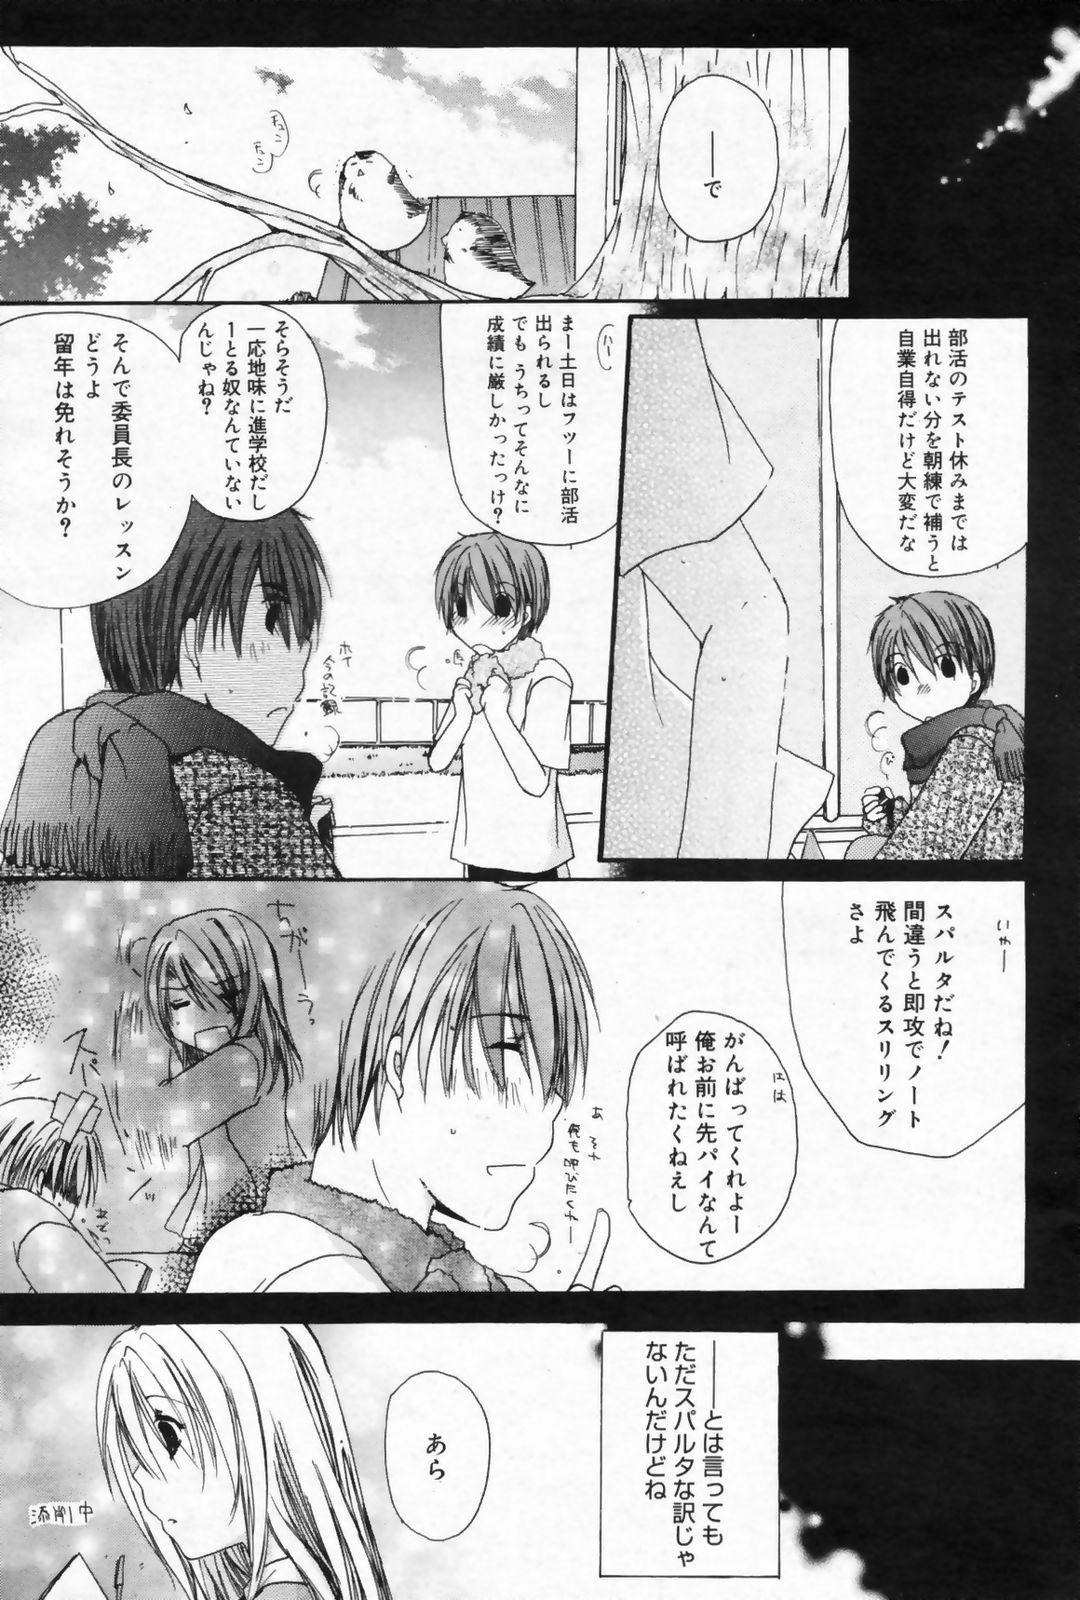 Manga Bangaichi 2009-02 Vol. 234 102